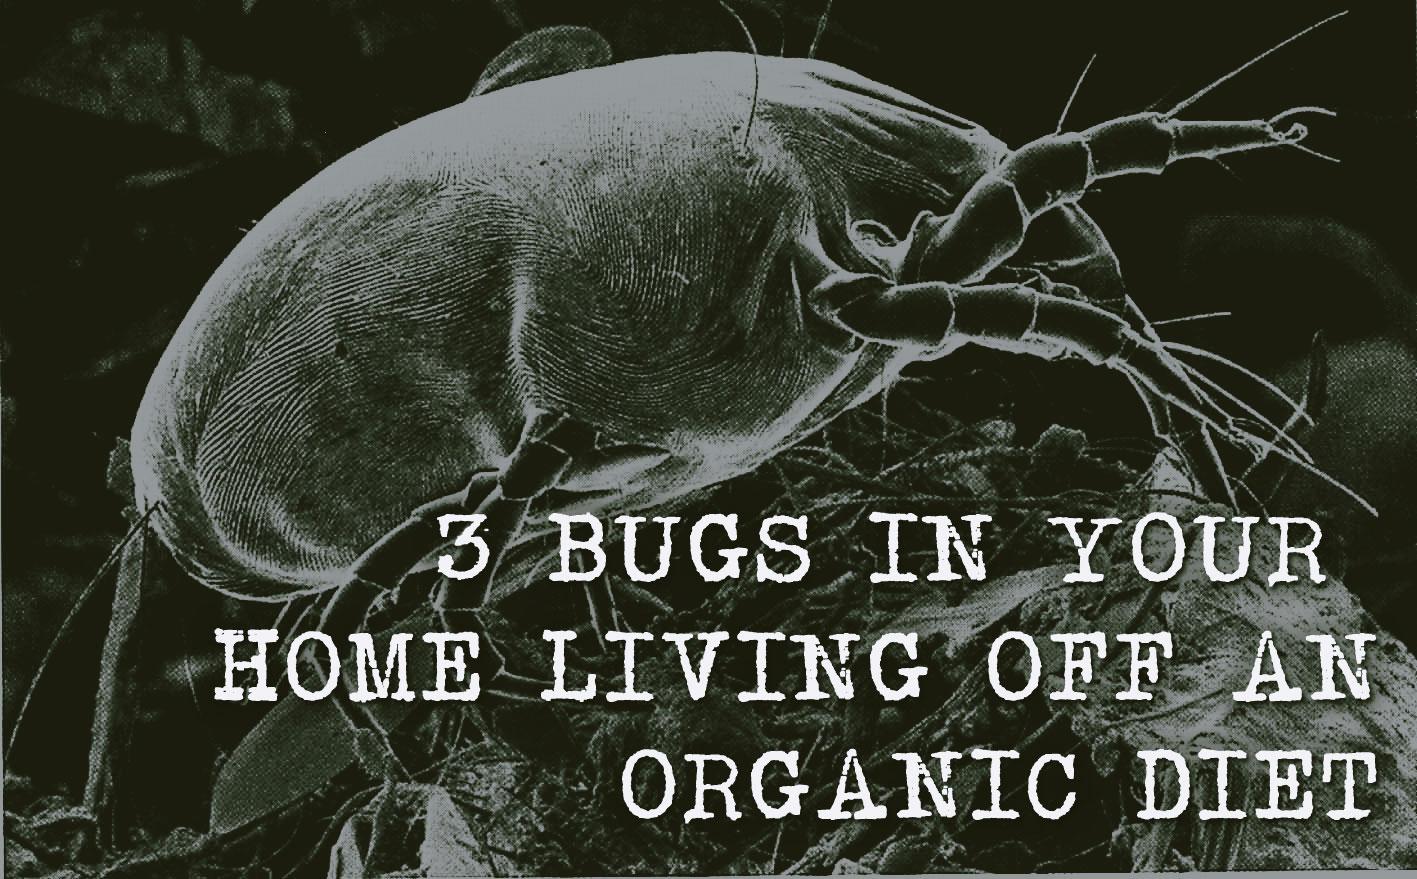 3-Bugs-Living-Off-Organic-Diet